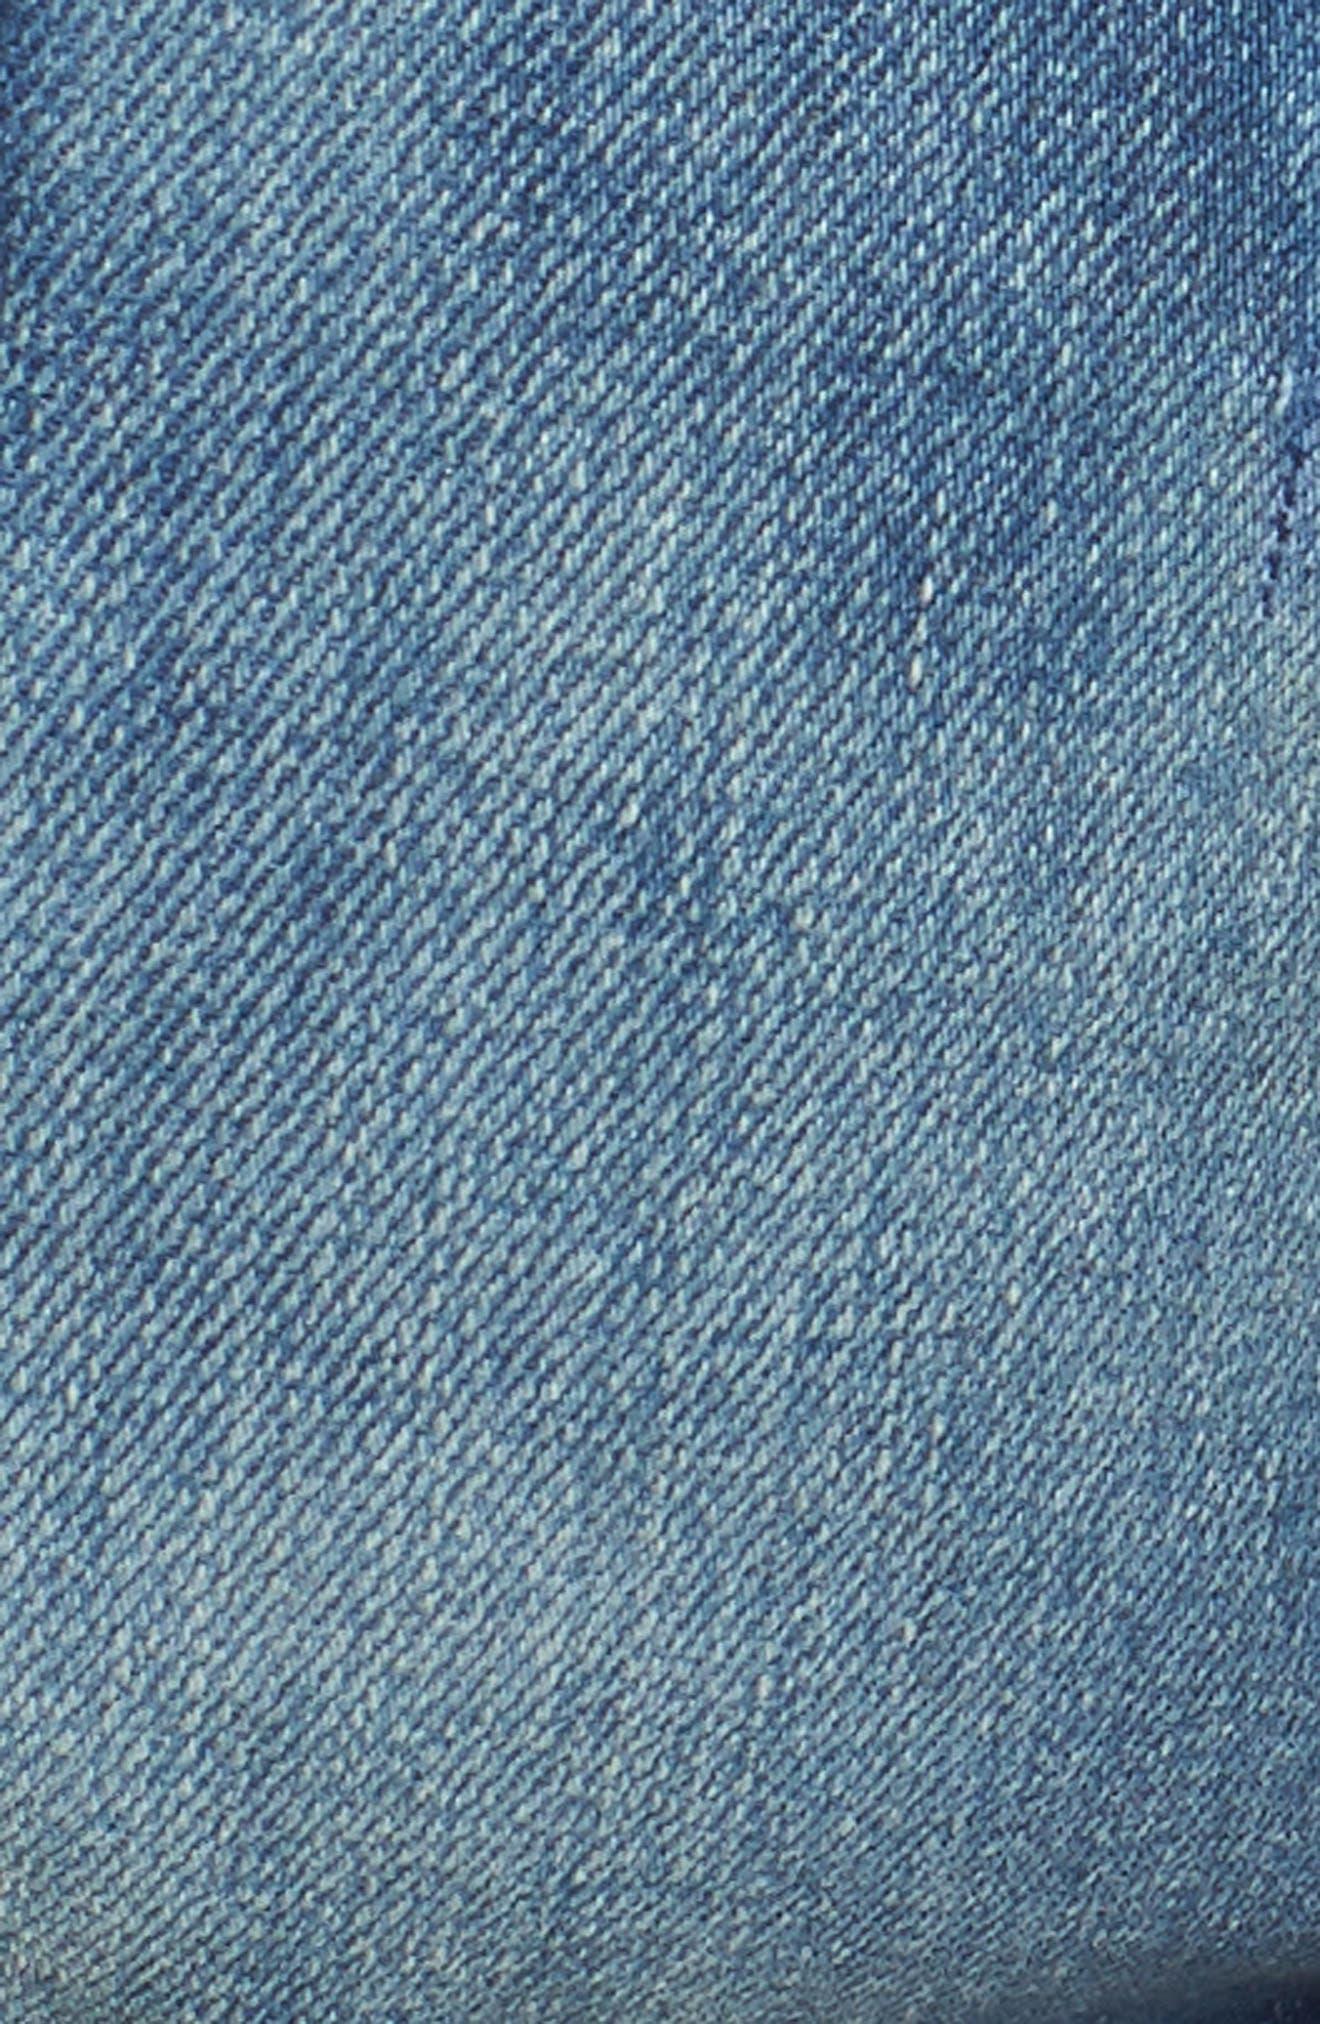 Cuffed Denim Shorts,                             Alternate thumbnail 6, color,                             Florida Light Blue Stretch